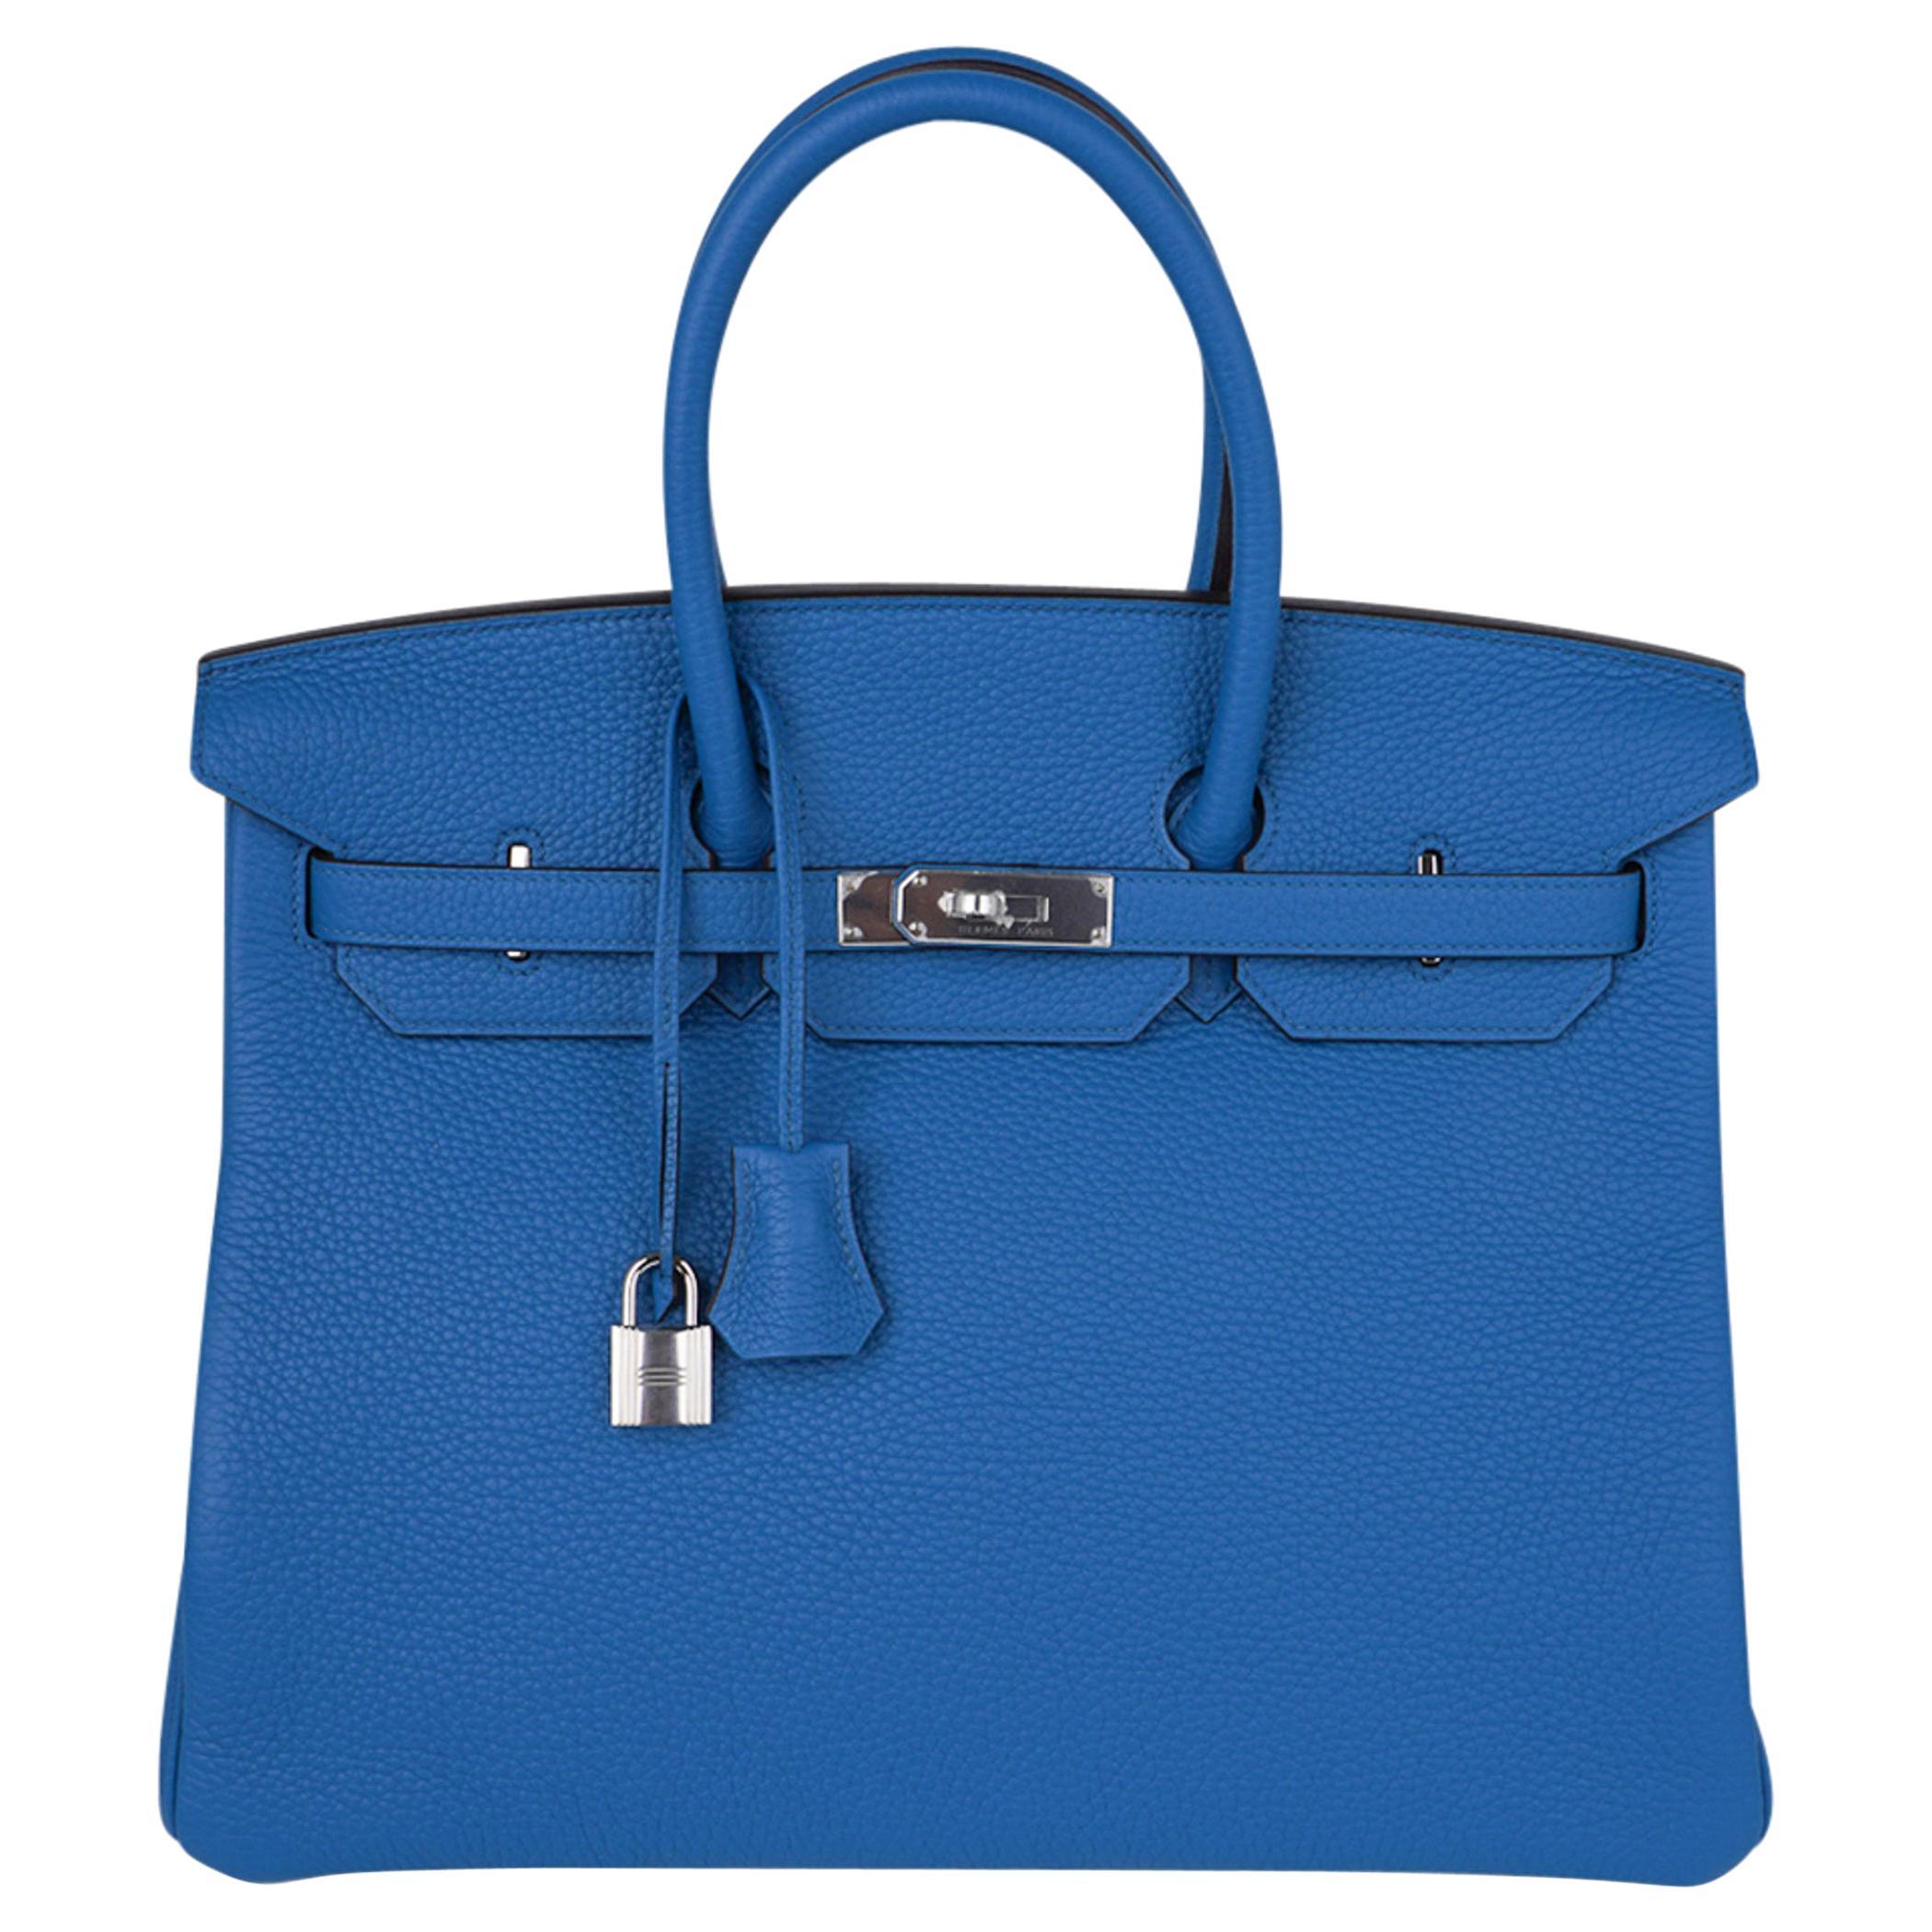 Hermes Birkin 35 Bag Blue Izmir Clemence Palladium Hardware